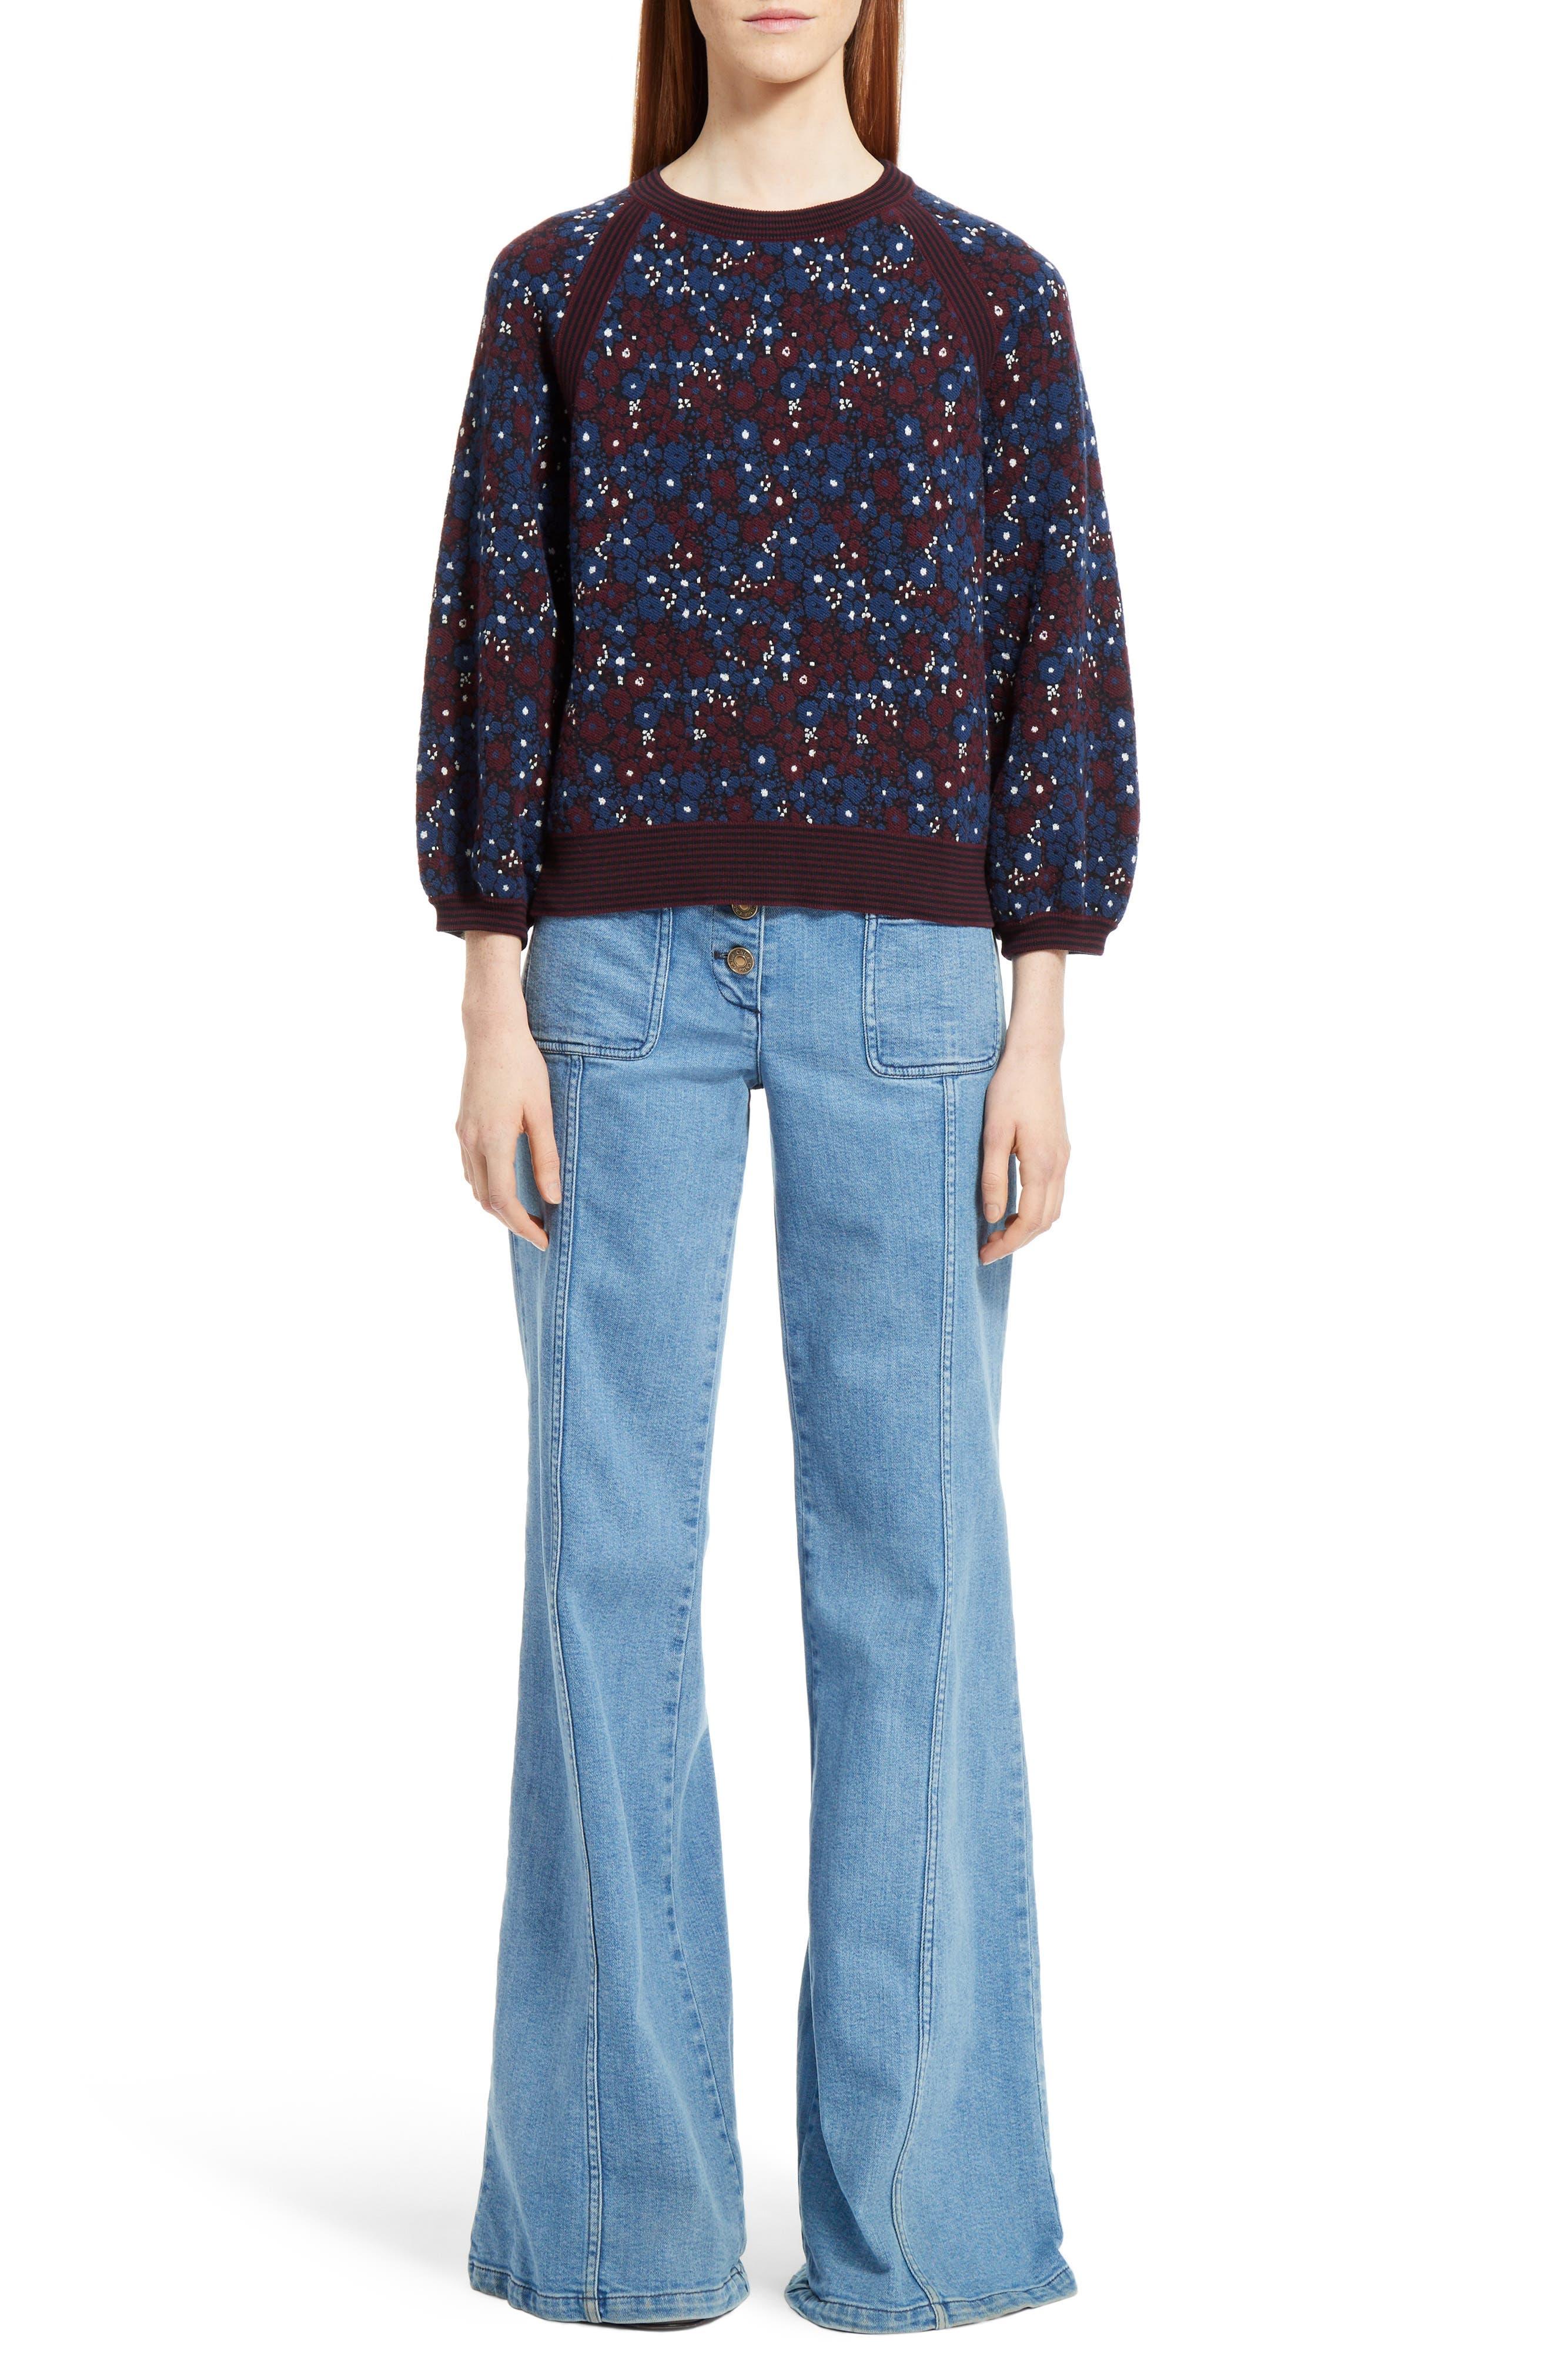 Chloé Floral Jacquard Sweater